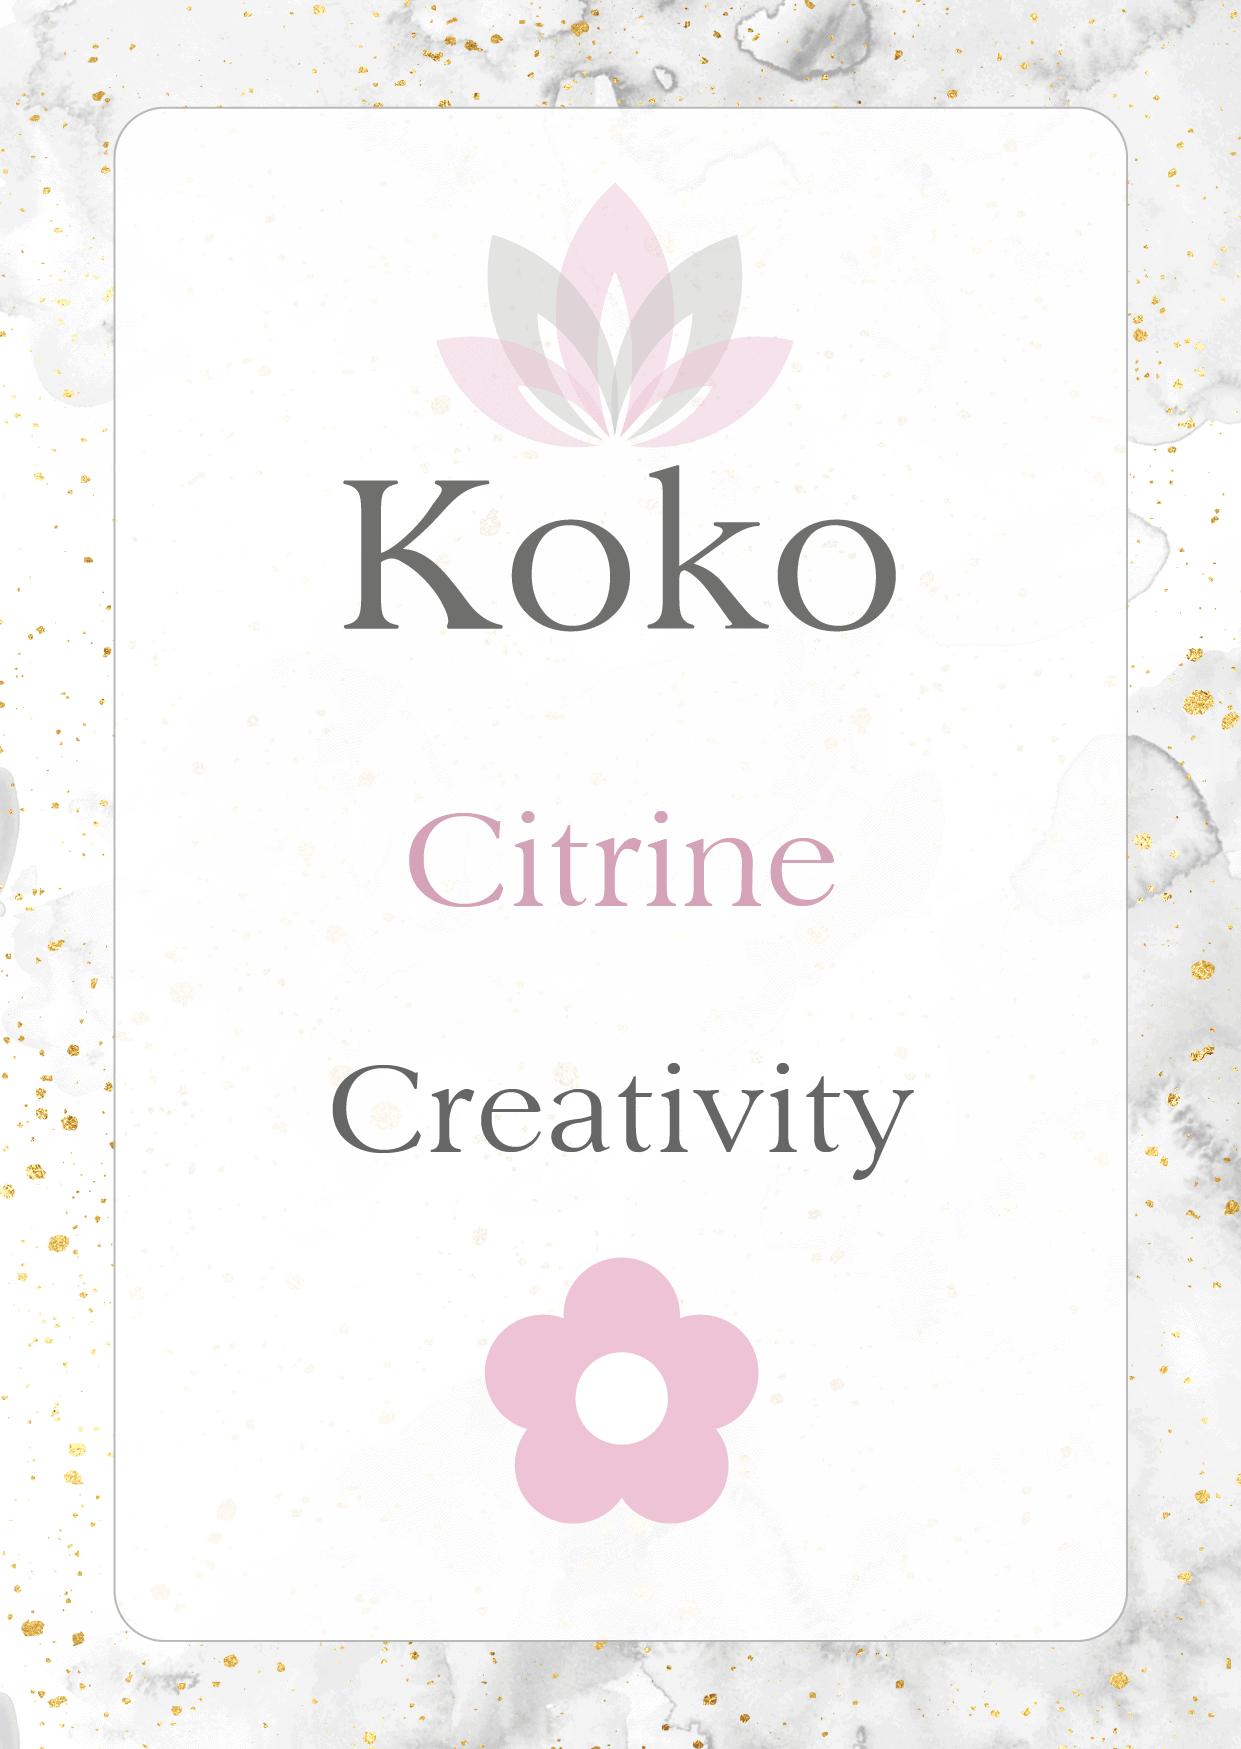 citrine Gemstone meaning creativity